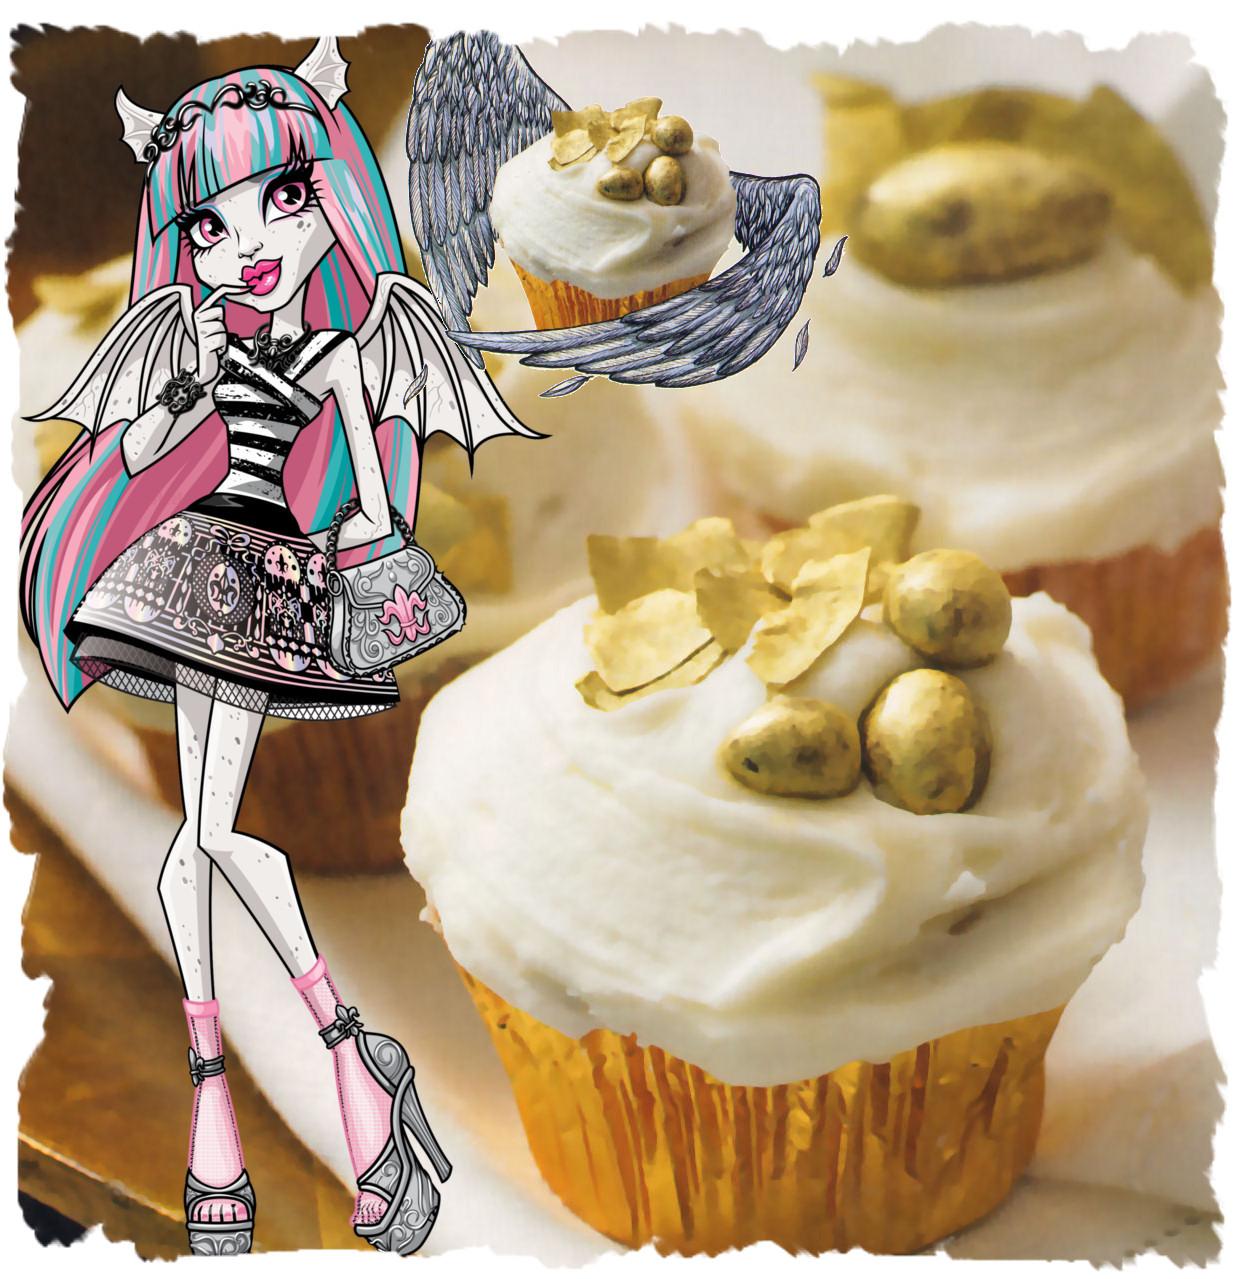 rochelle goyle Cupcakes Pastel de Angel Caido